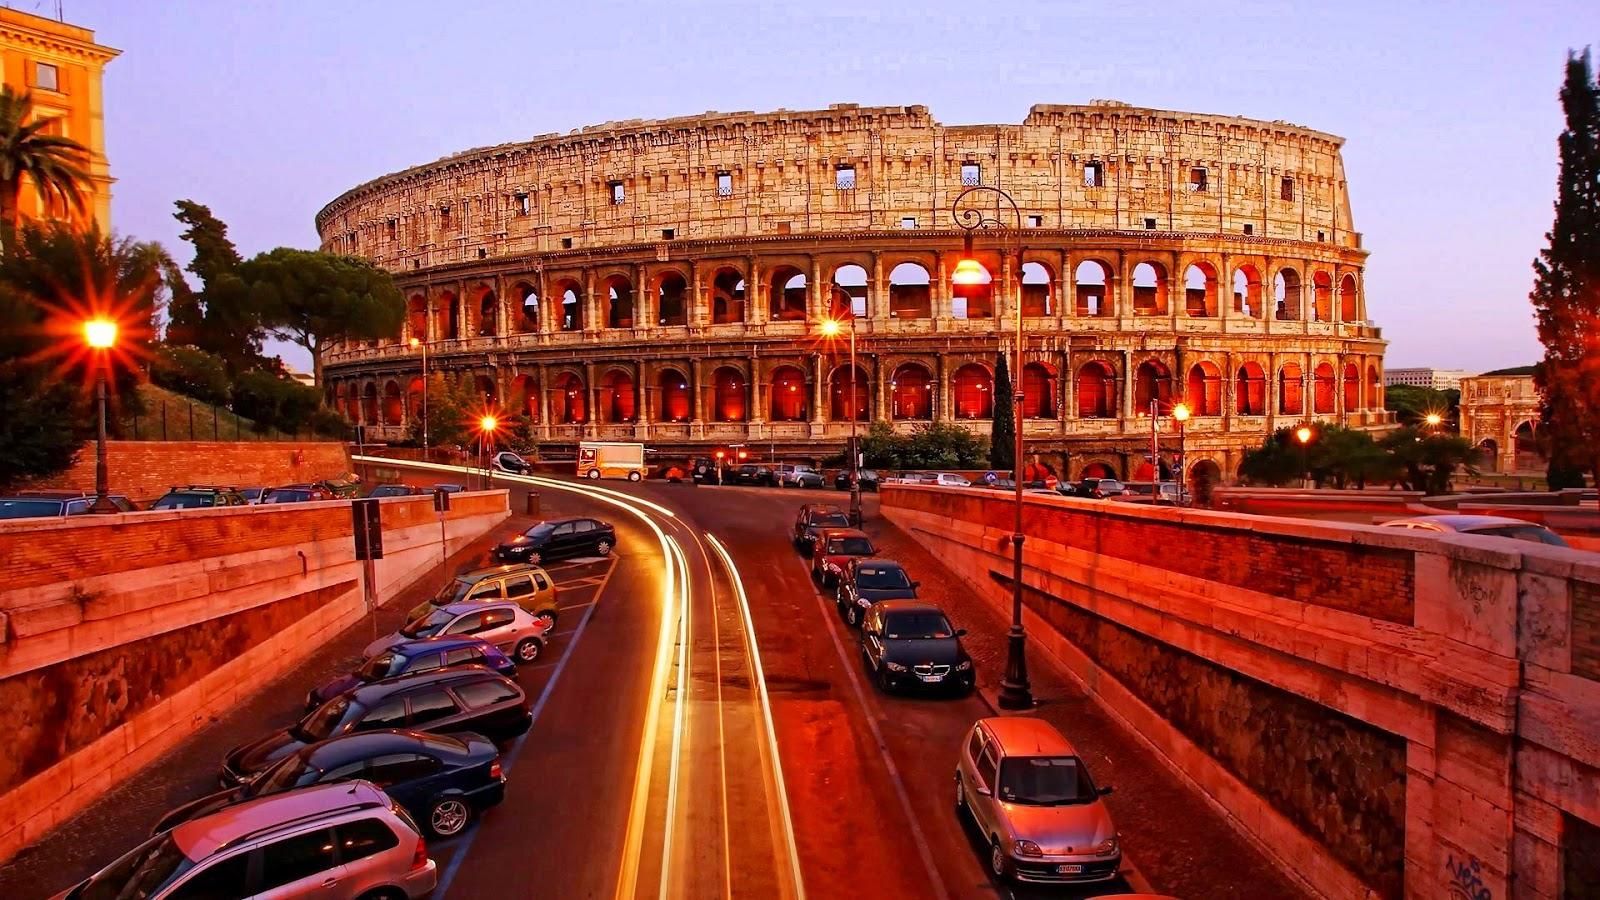 Beautiful Wallpaper Night Colosseum - colosseum-rome-wallpaper  Trends.jpg